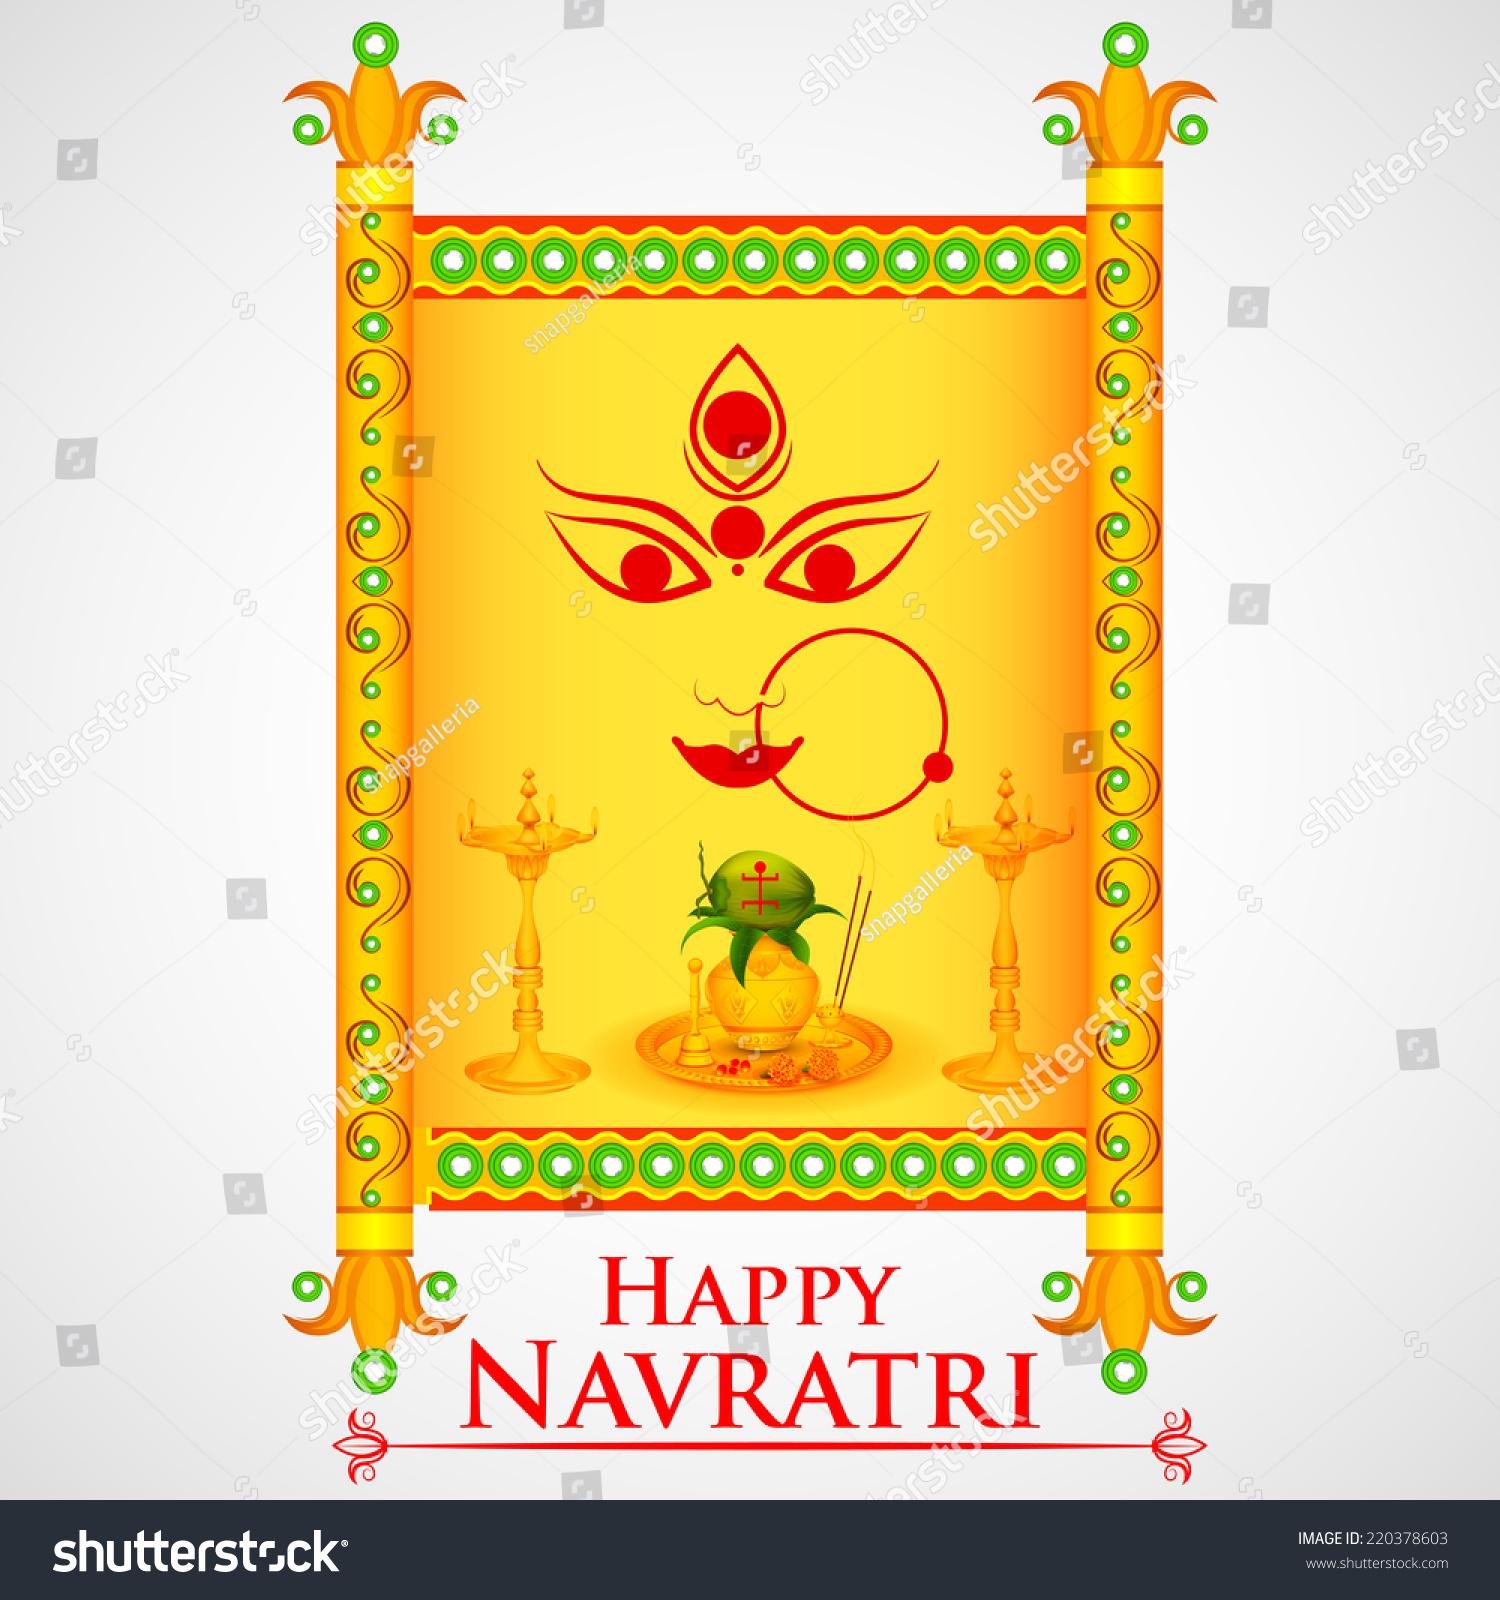 Easy Edit Vector Illustration Happy Navratri Stock Vector Royalty